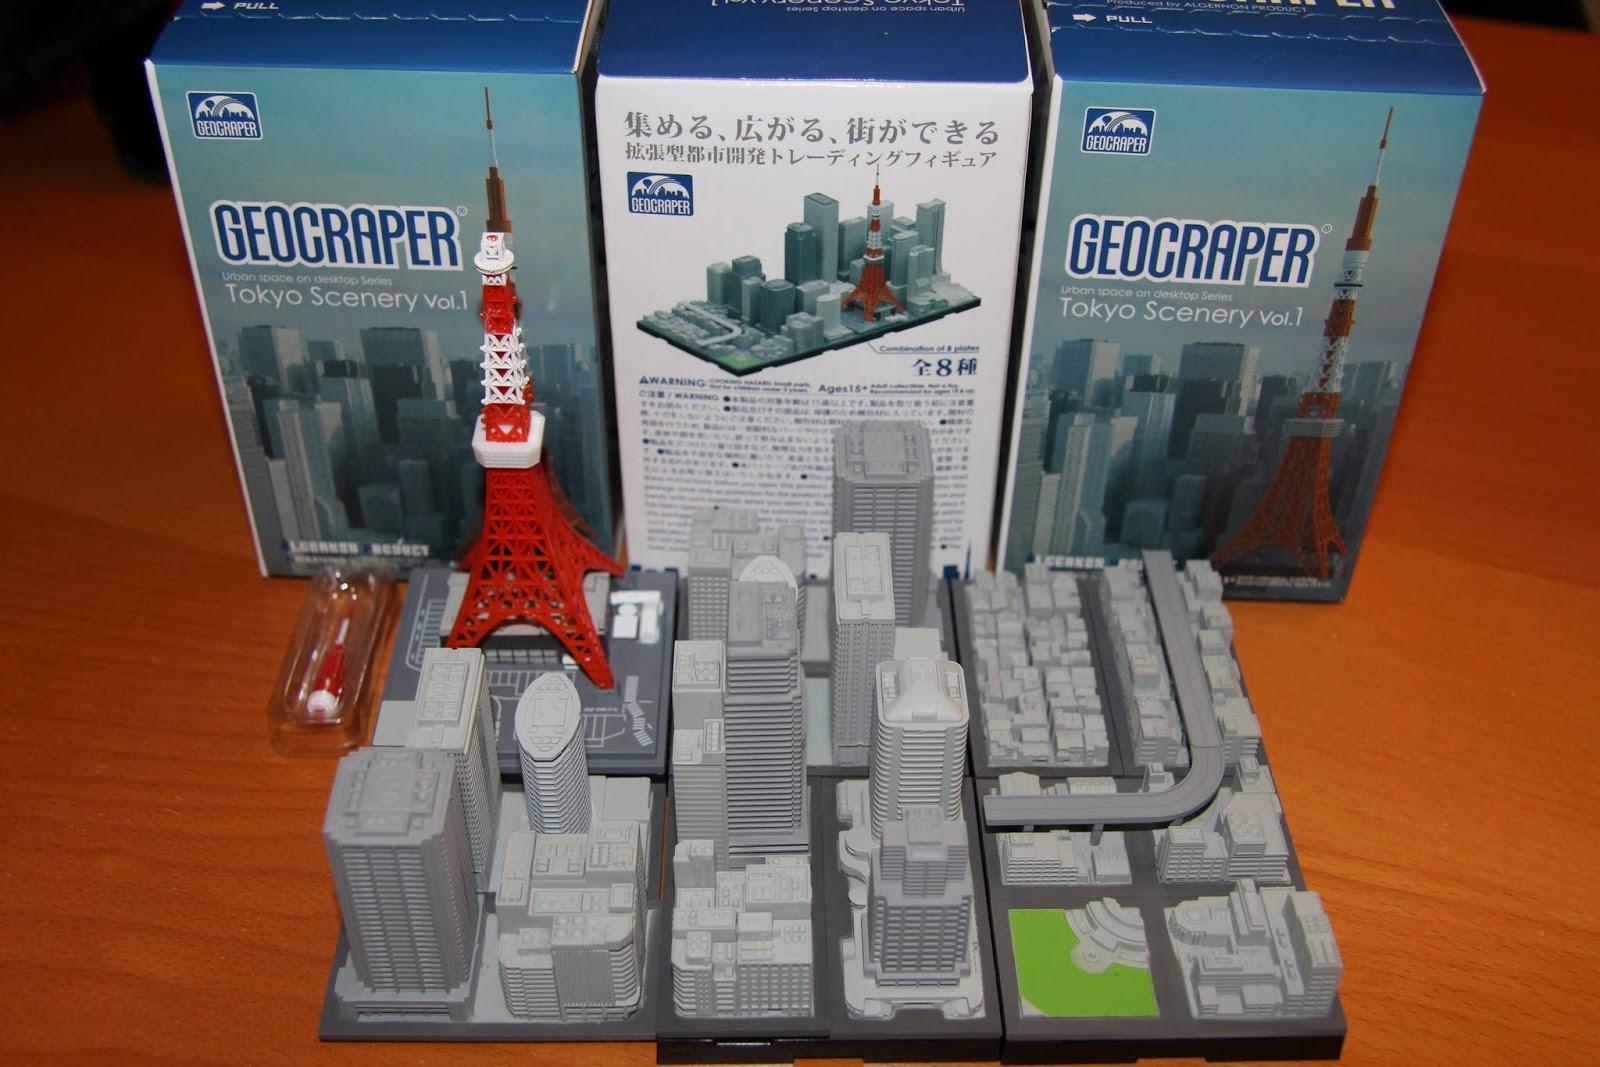 Tokyo Excess: Geocraper Miniatures of Tokyo For Dioramas